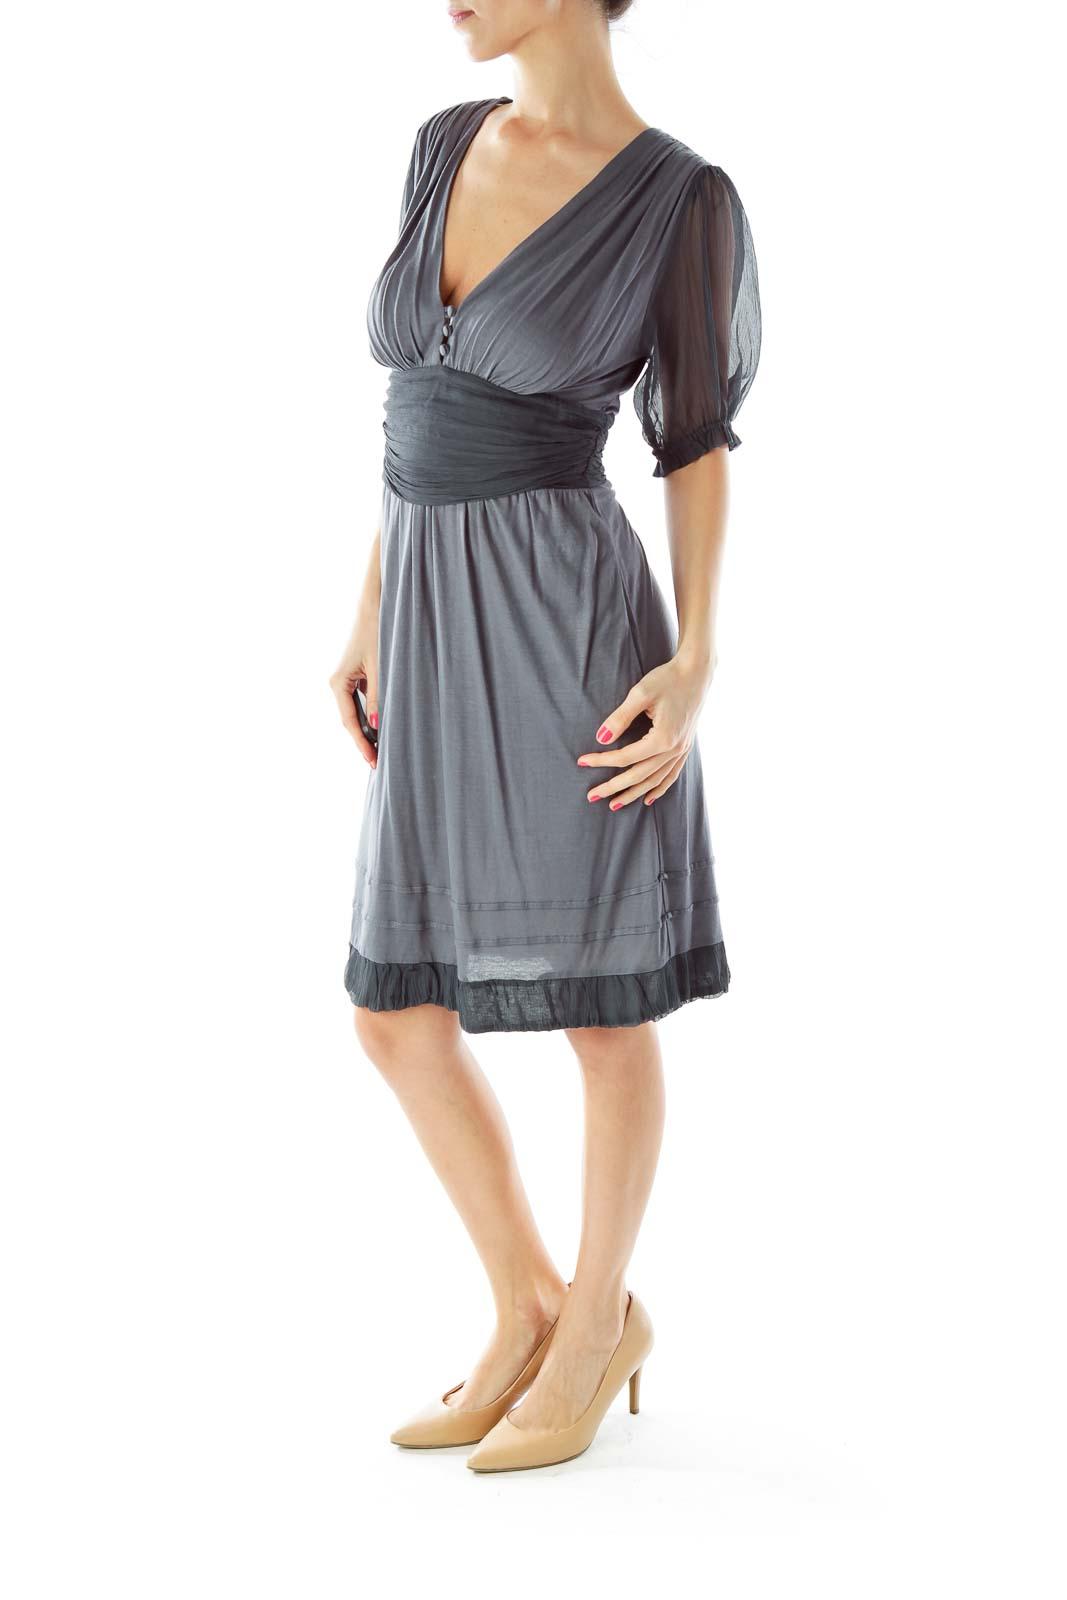 Gray Chiffon V-Neck Dress